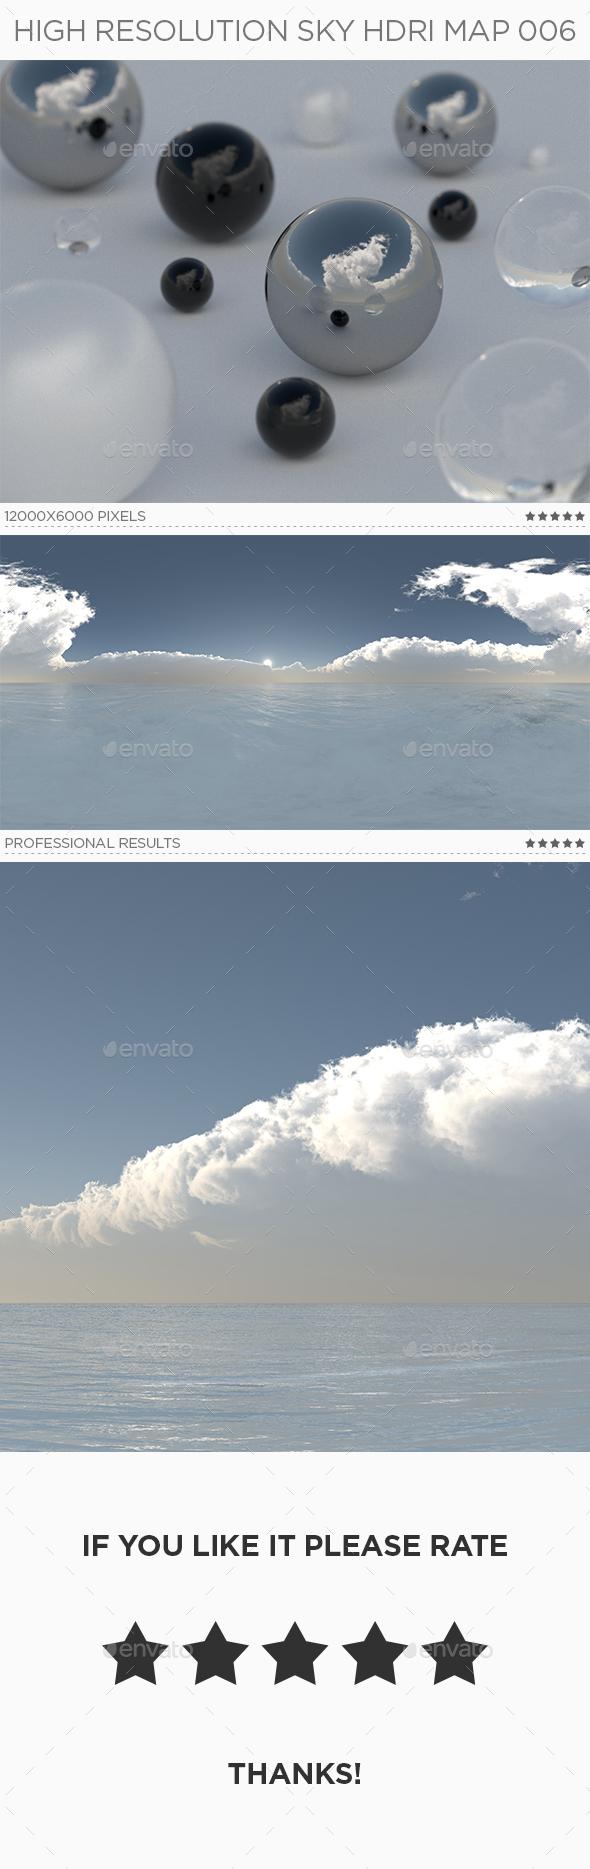 High Resolution sky HDRi Map 006 - 3DOcean Item for Sale